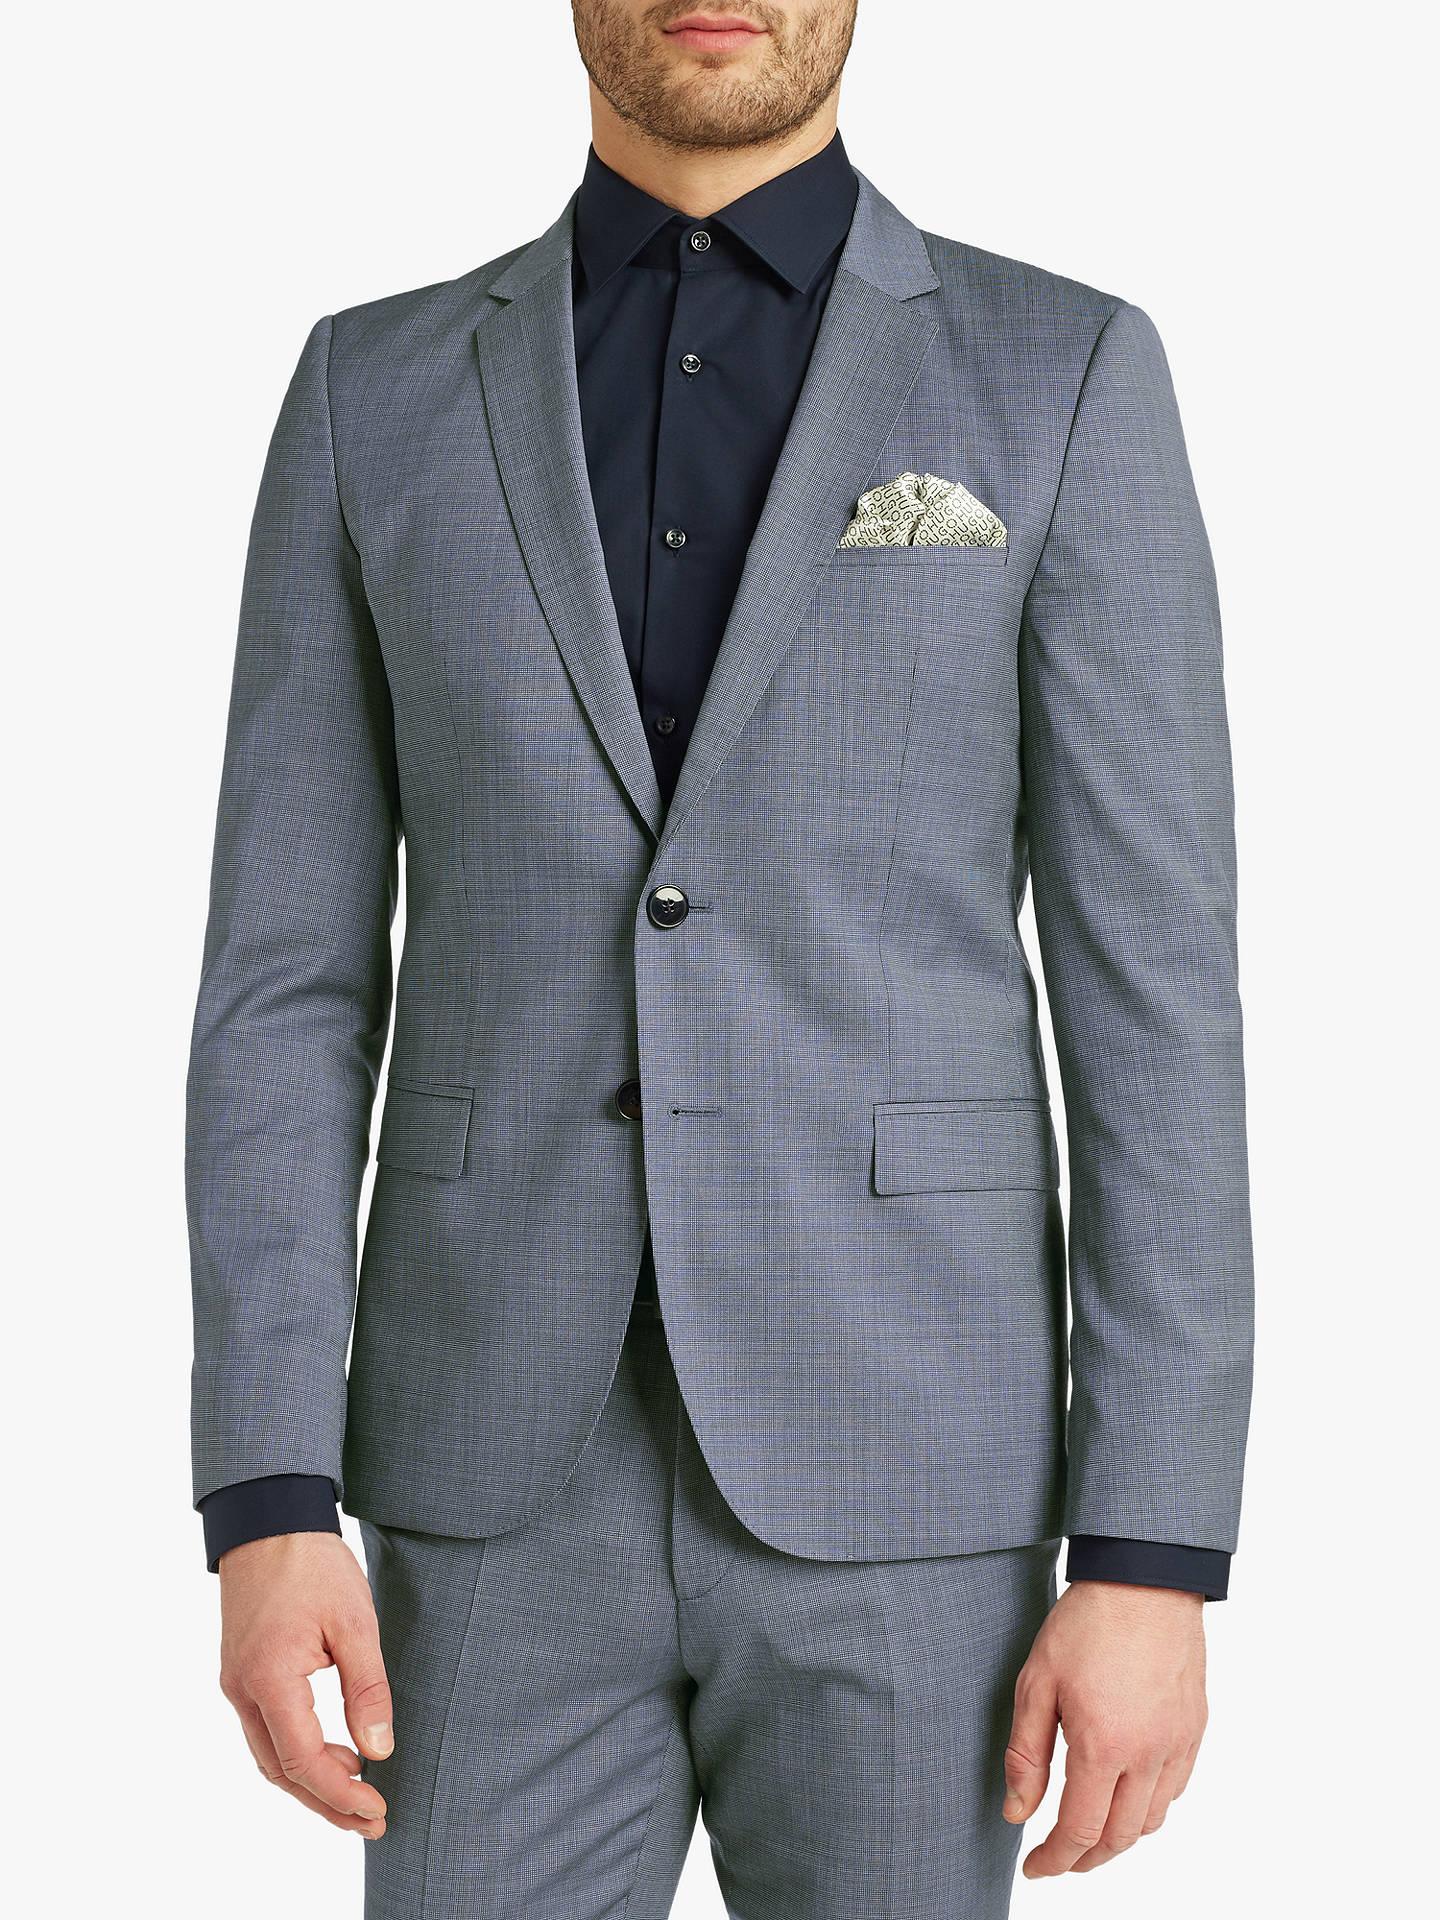 85bc71be821 Buy HUGO by Hugo Boss Arti 182 Pin Dot Wool Super Slim Suit Jacket